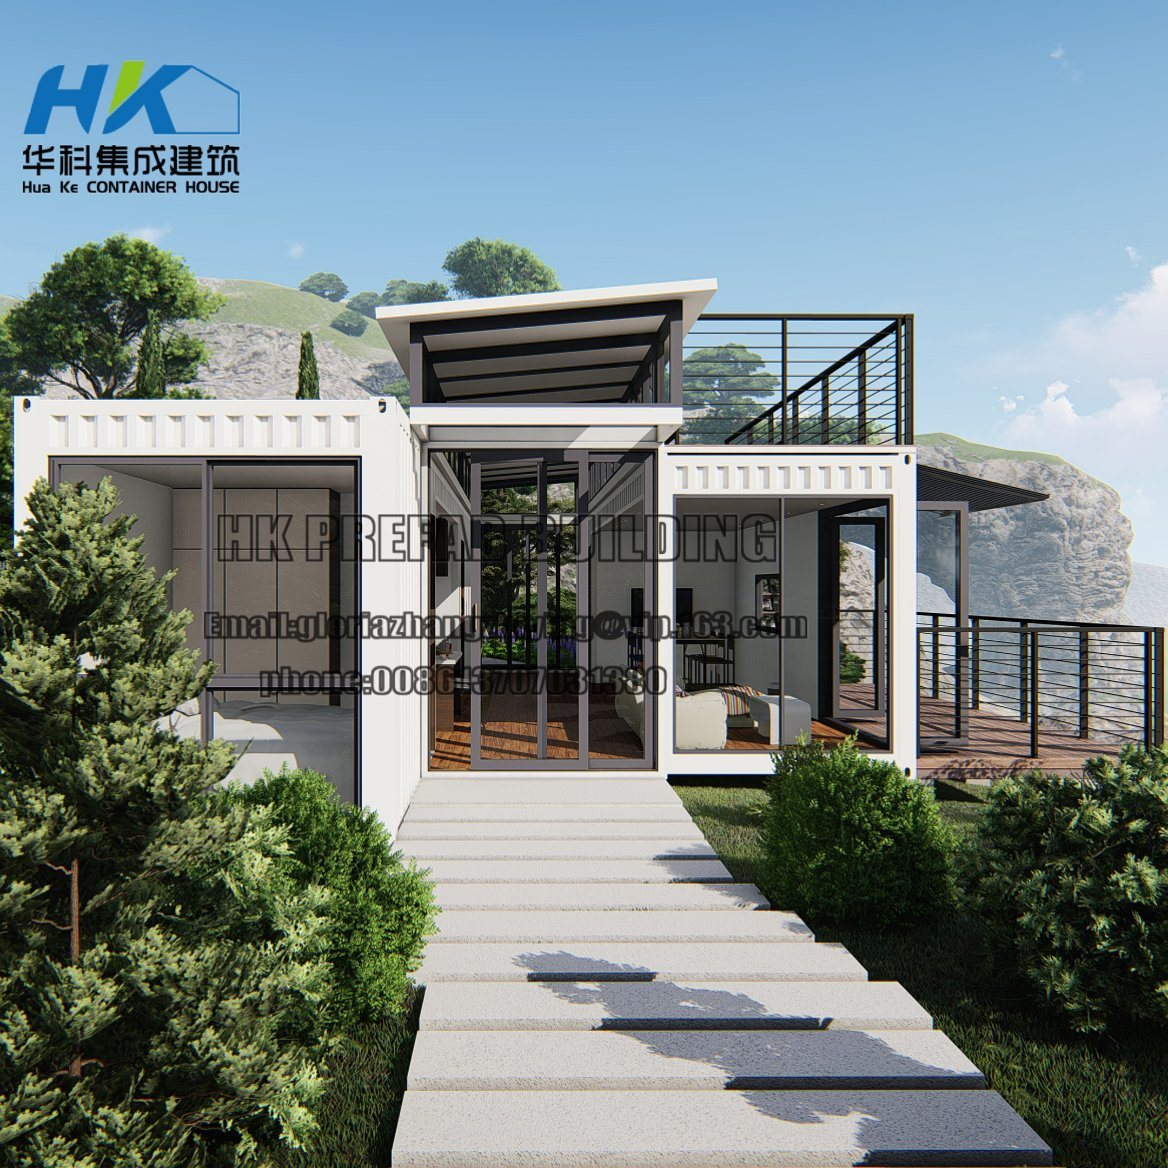 Modern Shipping Container Home [hot item] high quality modular prefab/ prefabricating modern design  shipping container house